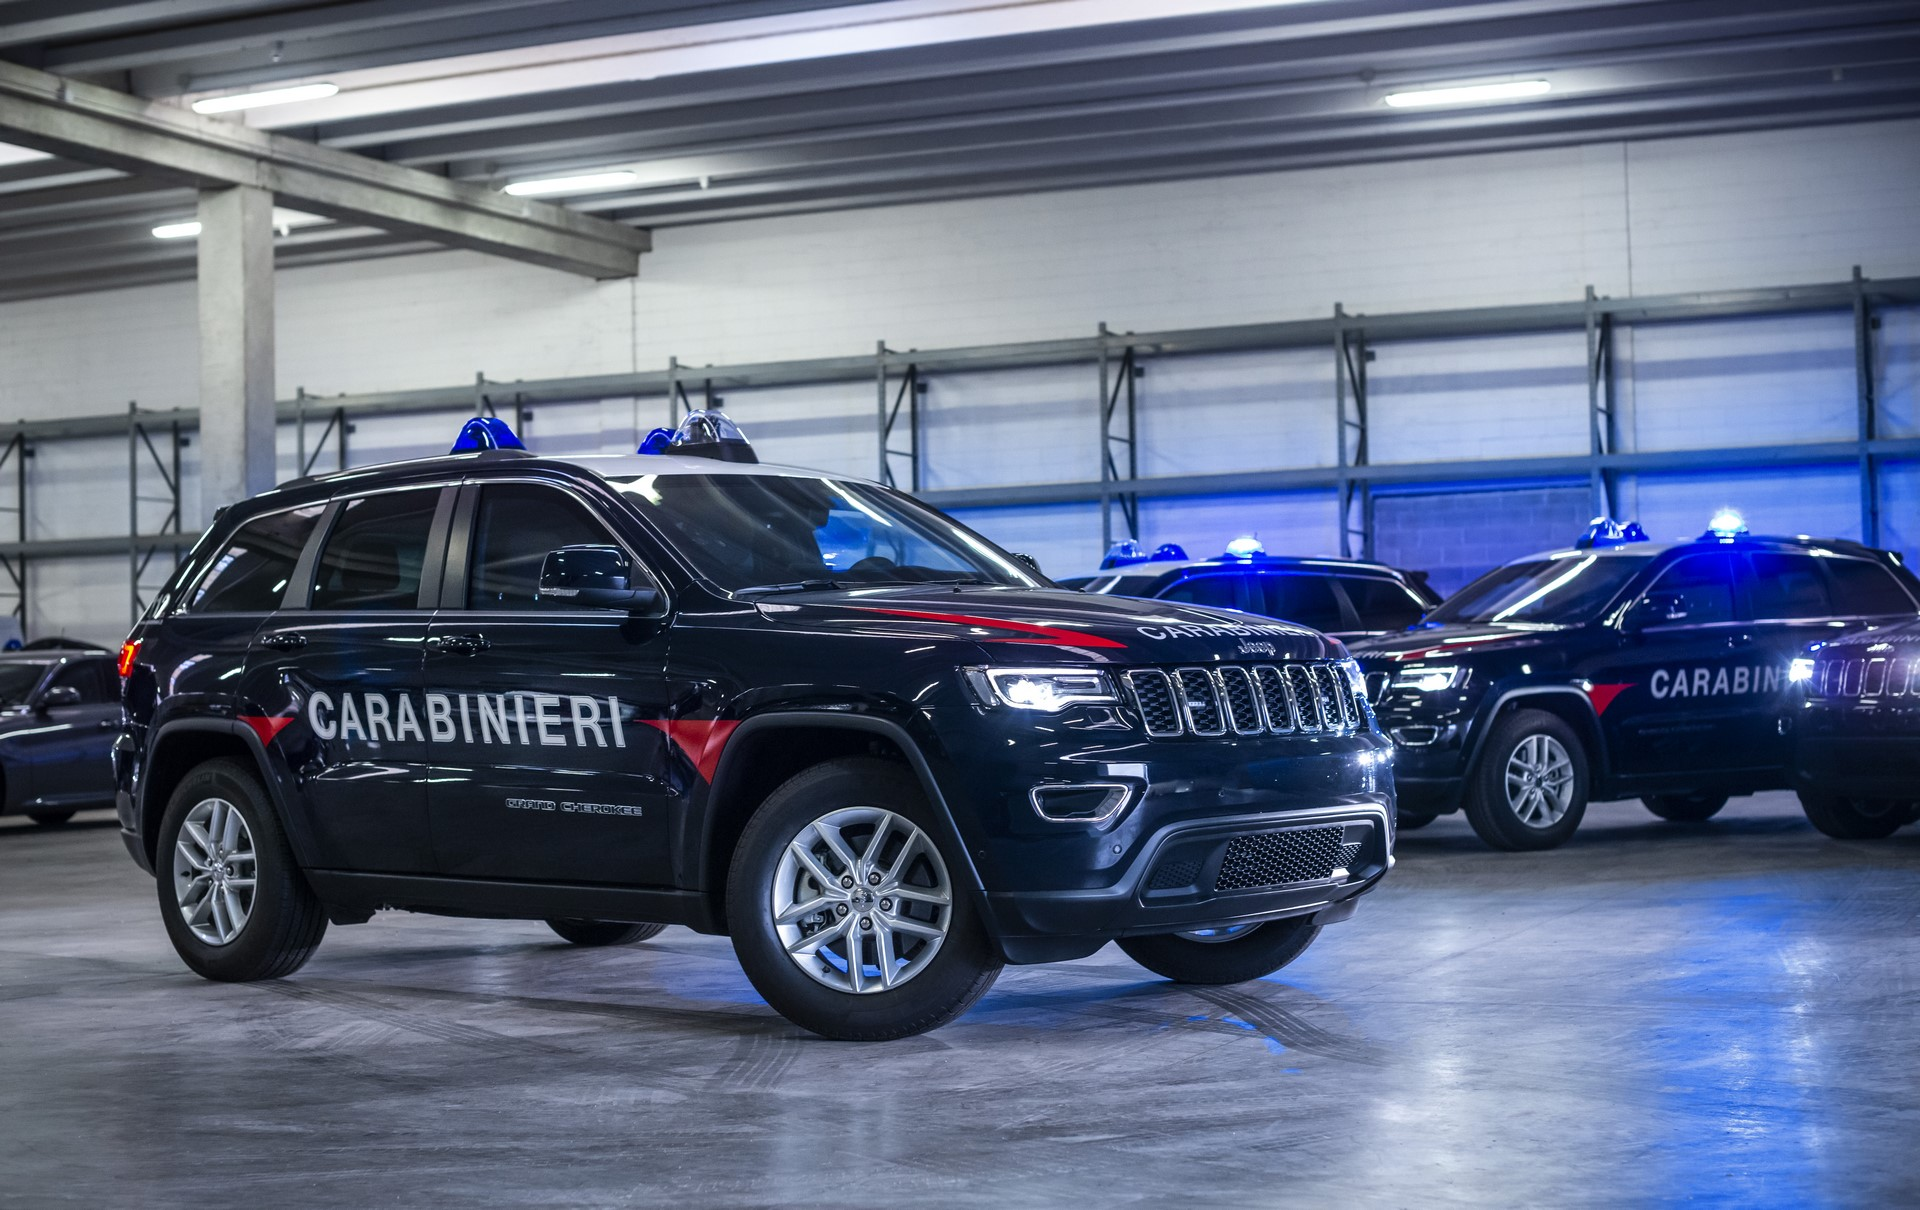 Jeep Grand Cherokee Carabinieri (11)